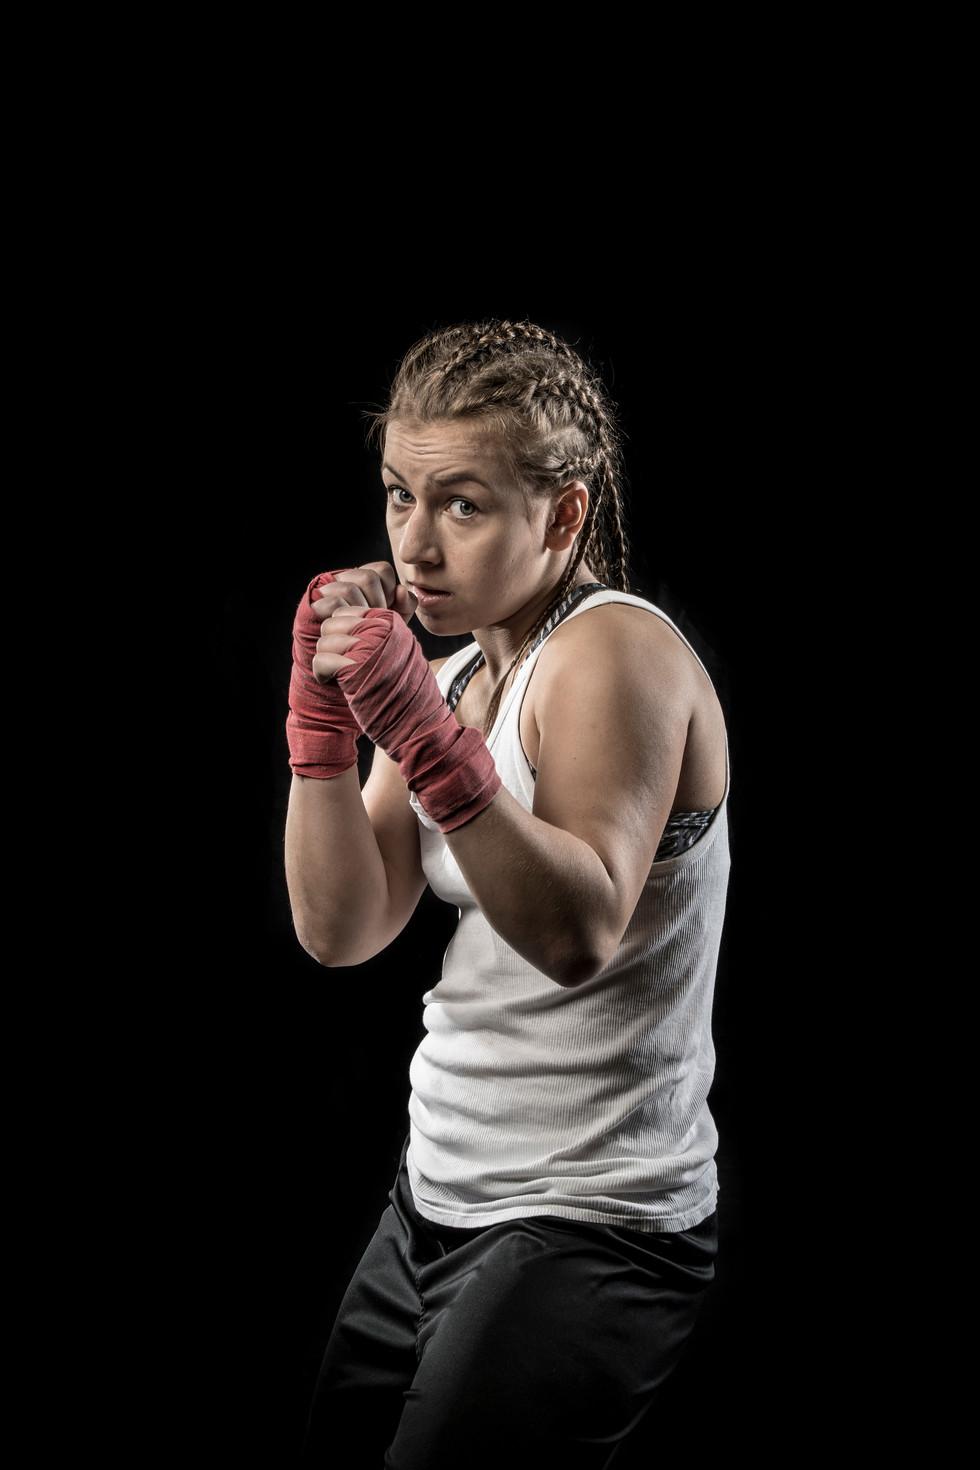 Sportfotografie-Boxen-Boxerin-7.jpg